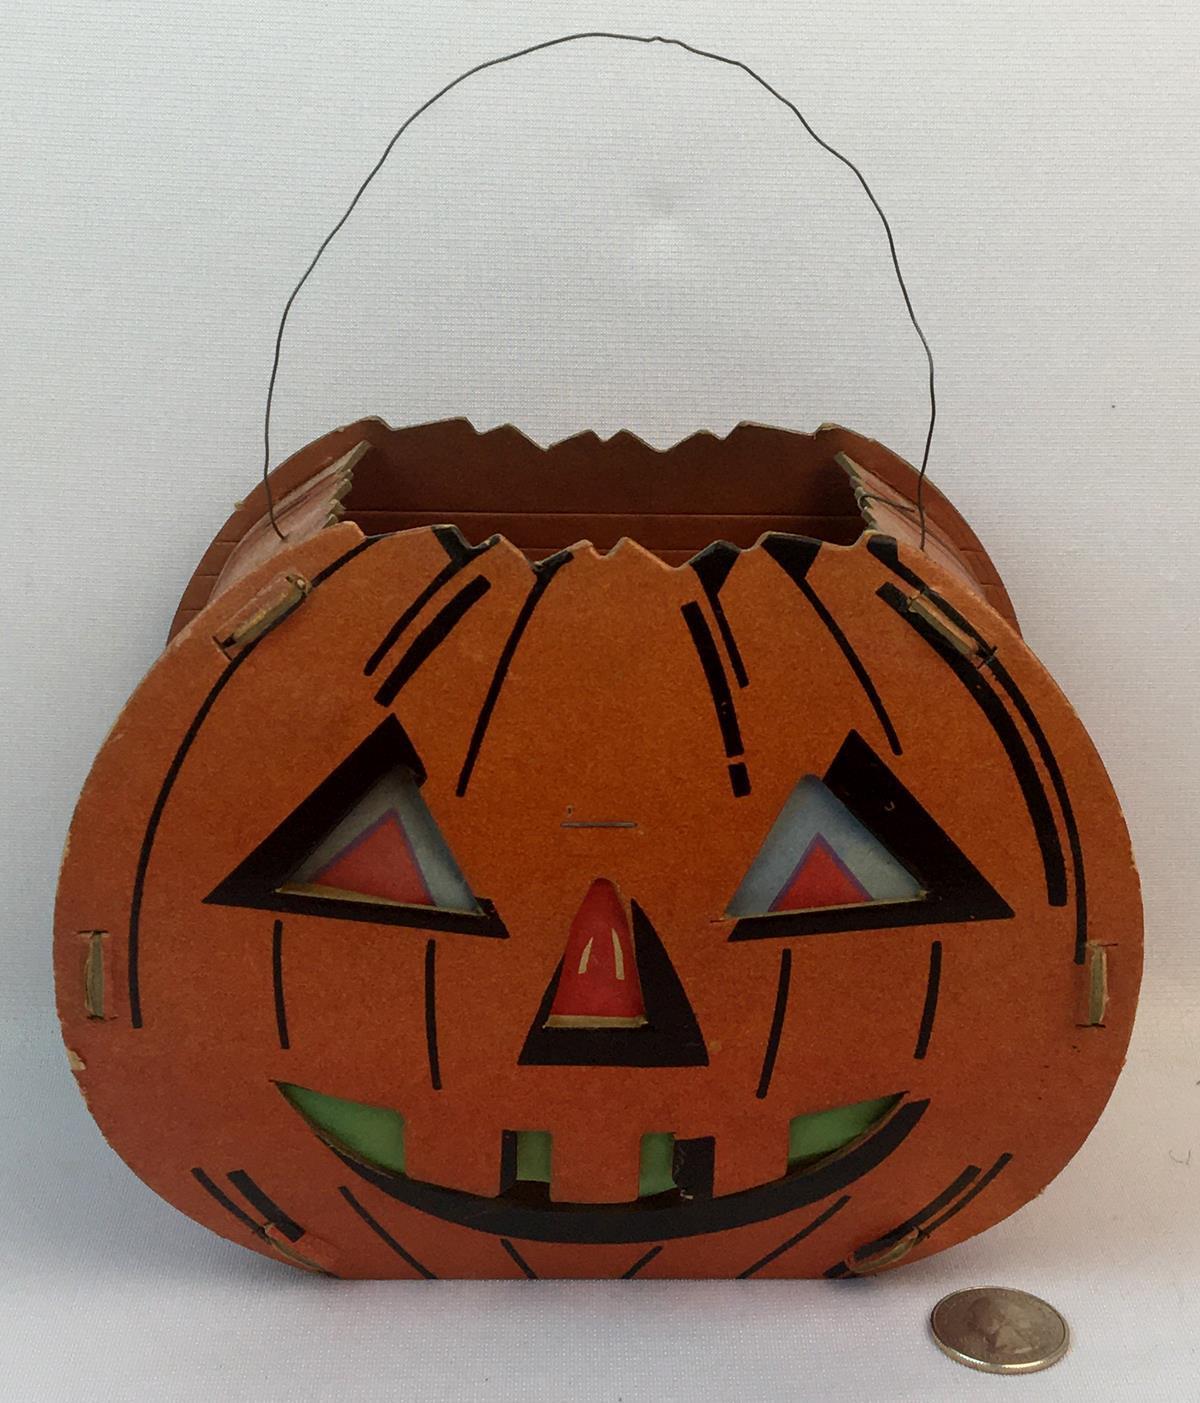 Vintage c. 1950 Original Halloween Pumpkin Cardboard Jack-O-Lantern w/ Face Inserts and Candle Holder